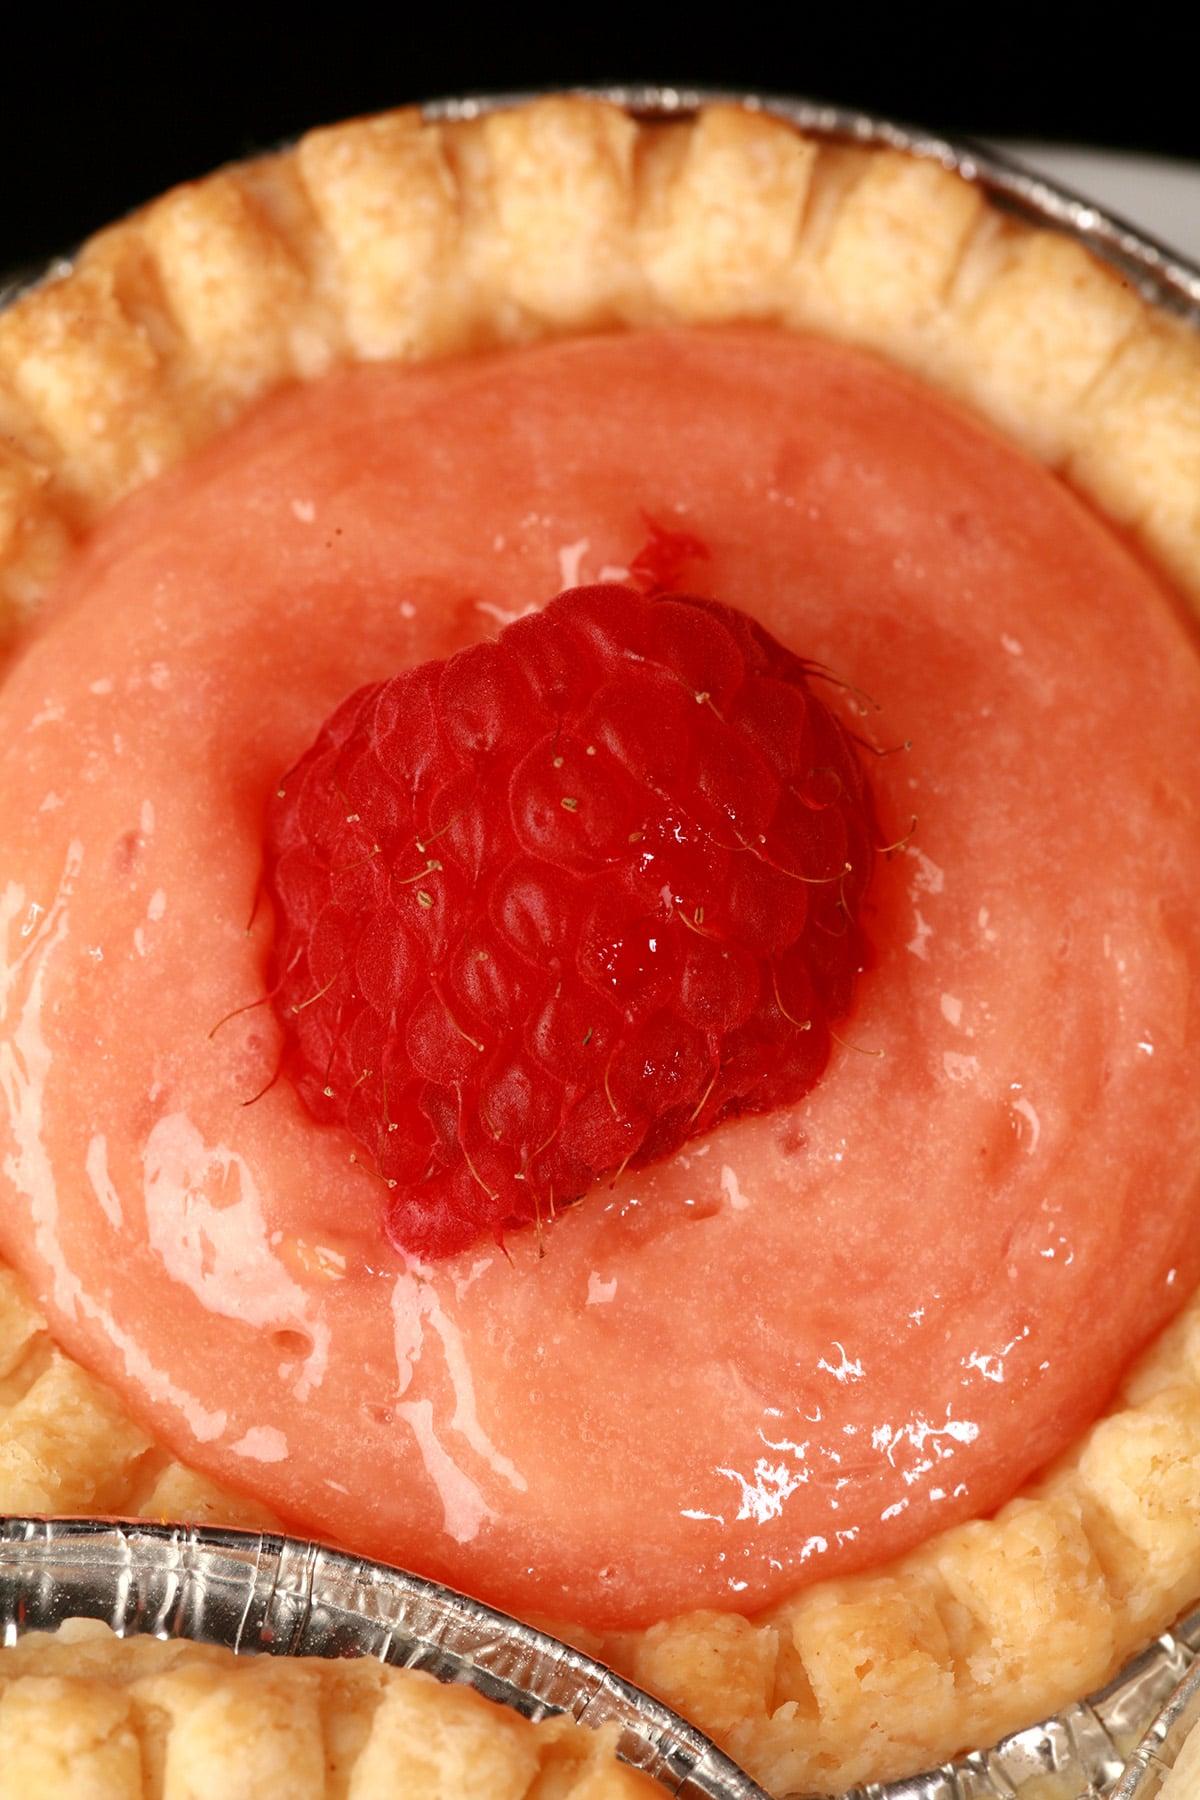 A close up view of a raspberry tart.